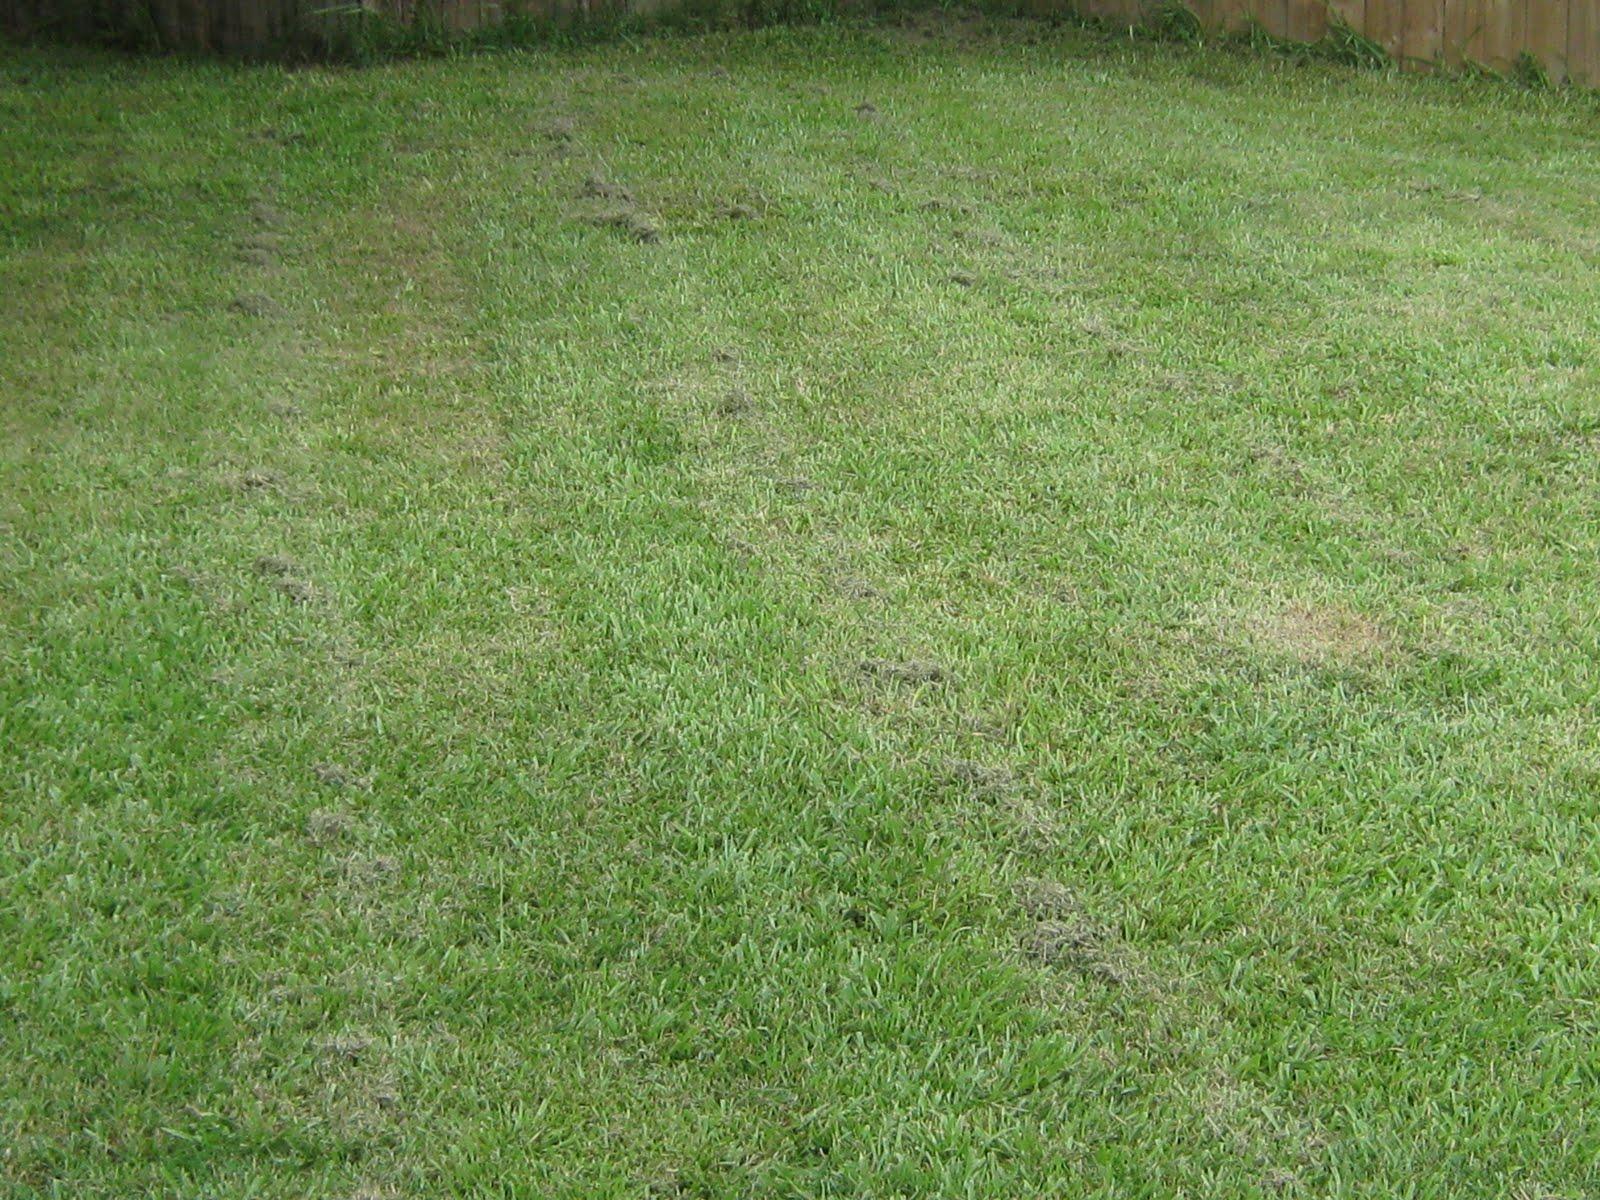 Lawn Cutting Patterns 171 Free Patterns